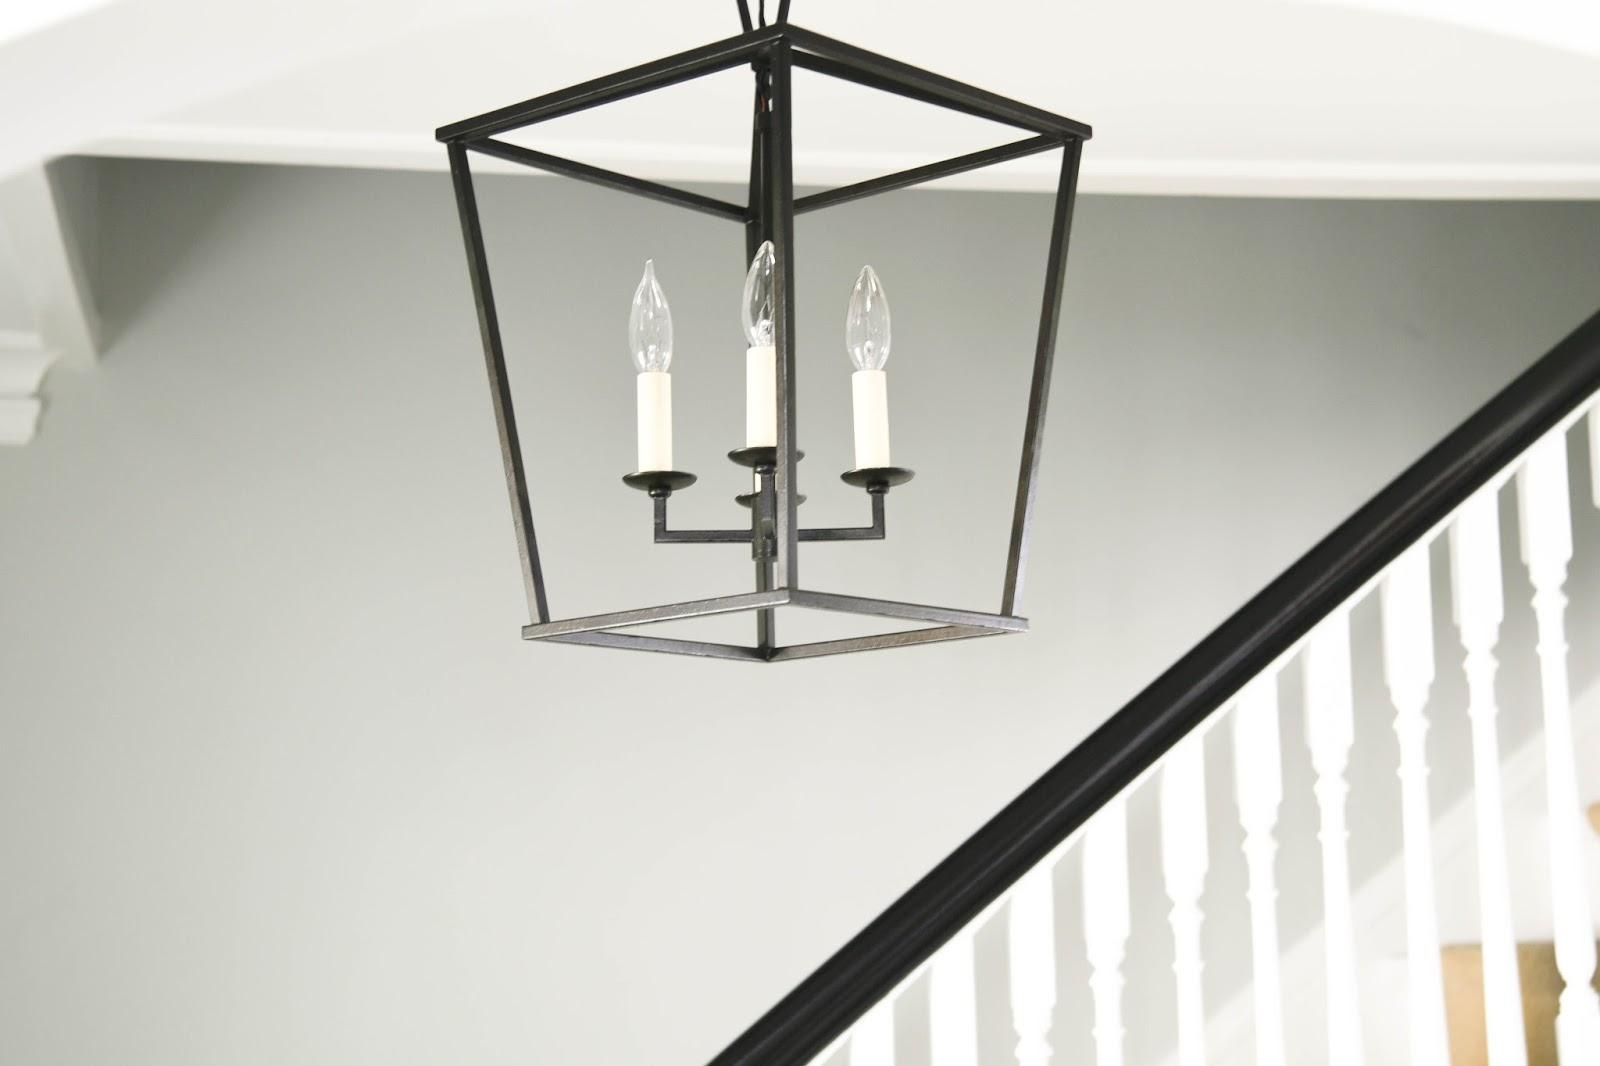 Inspirational Foyer Lantern Chandelier for any Modern American Farmhouse lightfixtures lanterns design